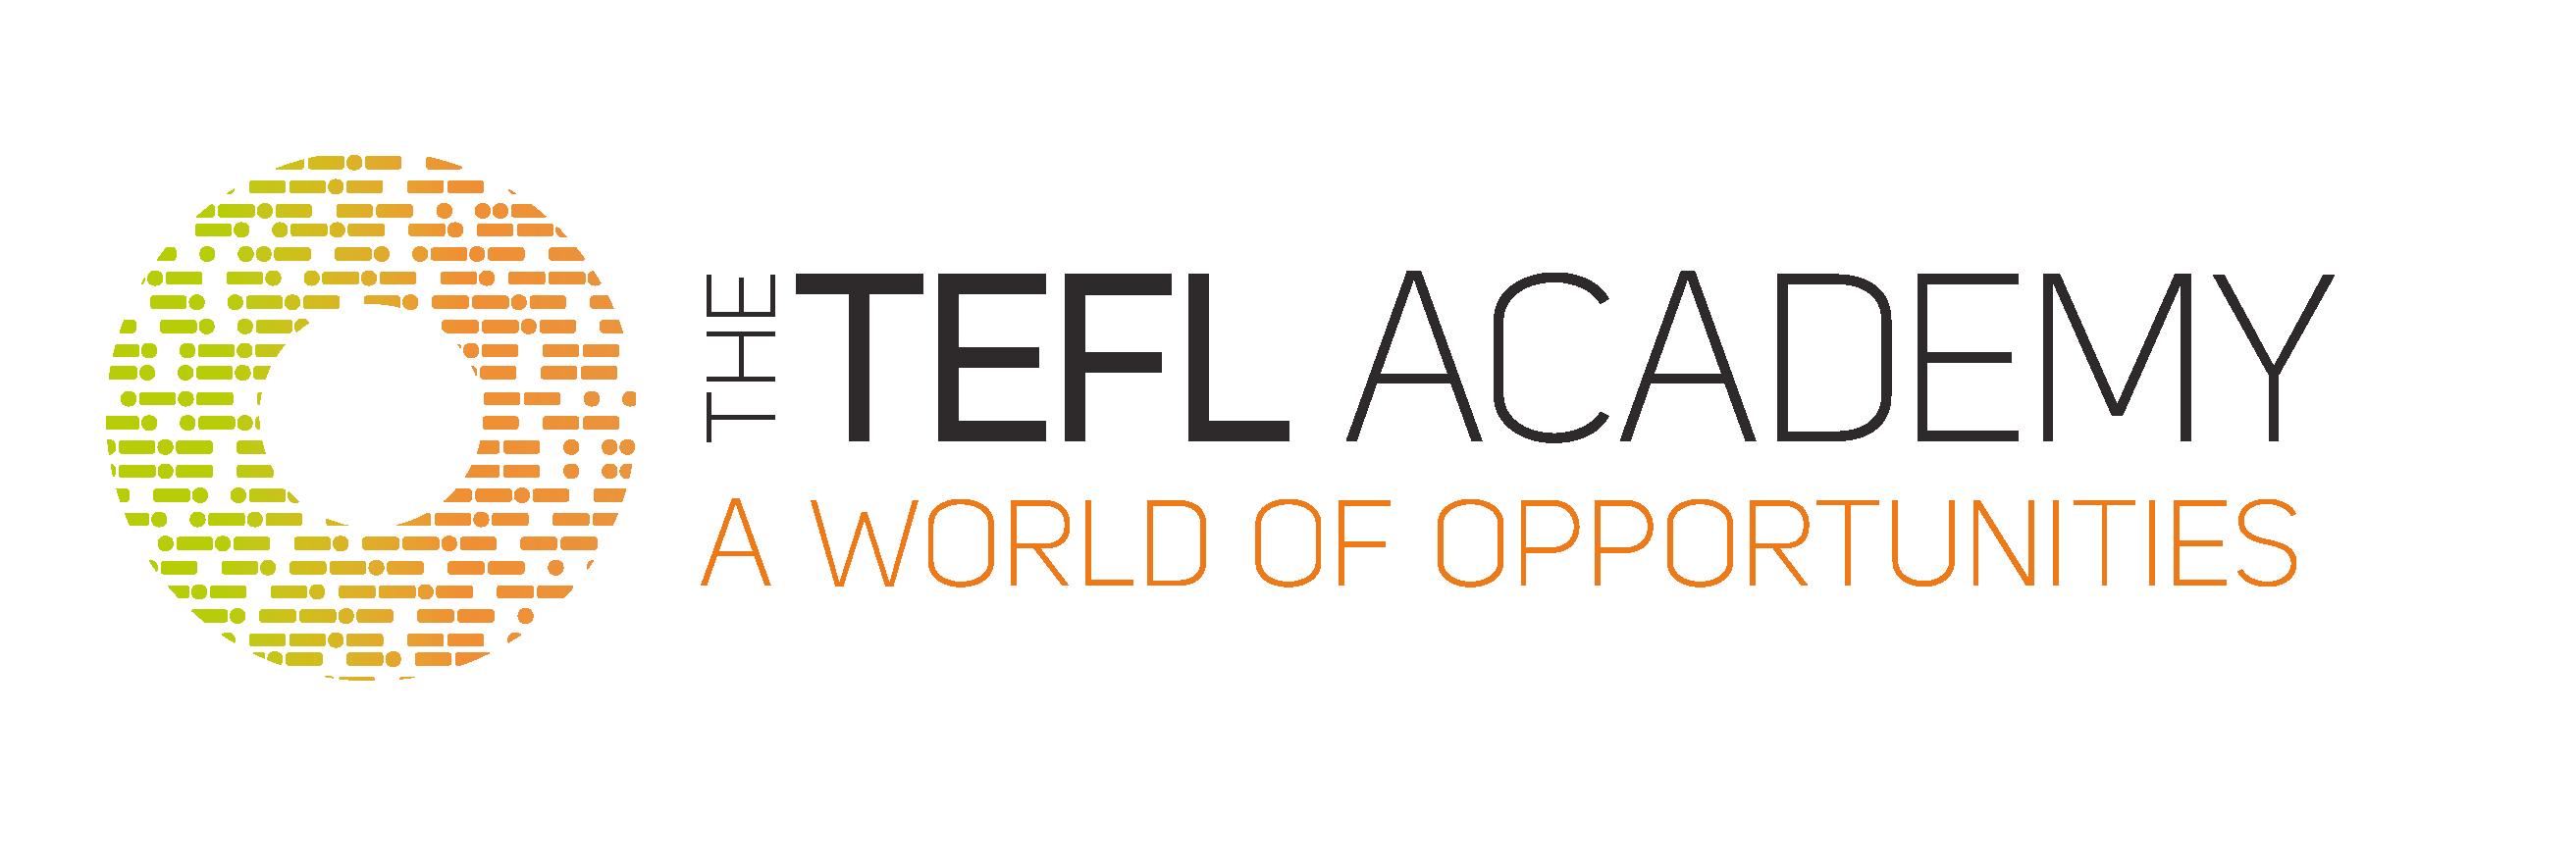 TEFL Academy logo.png